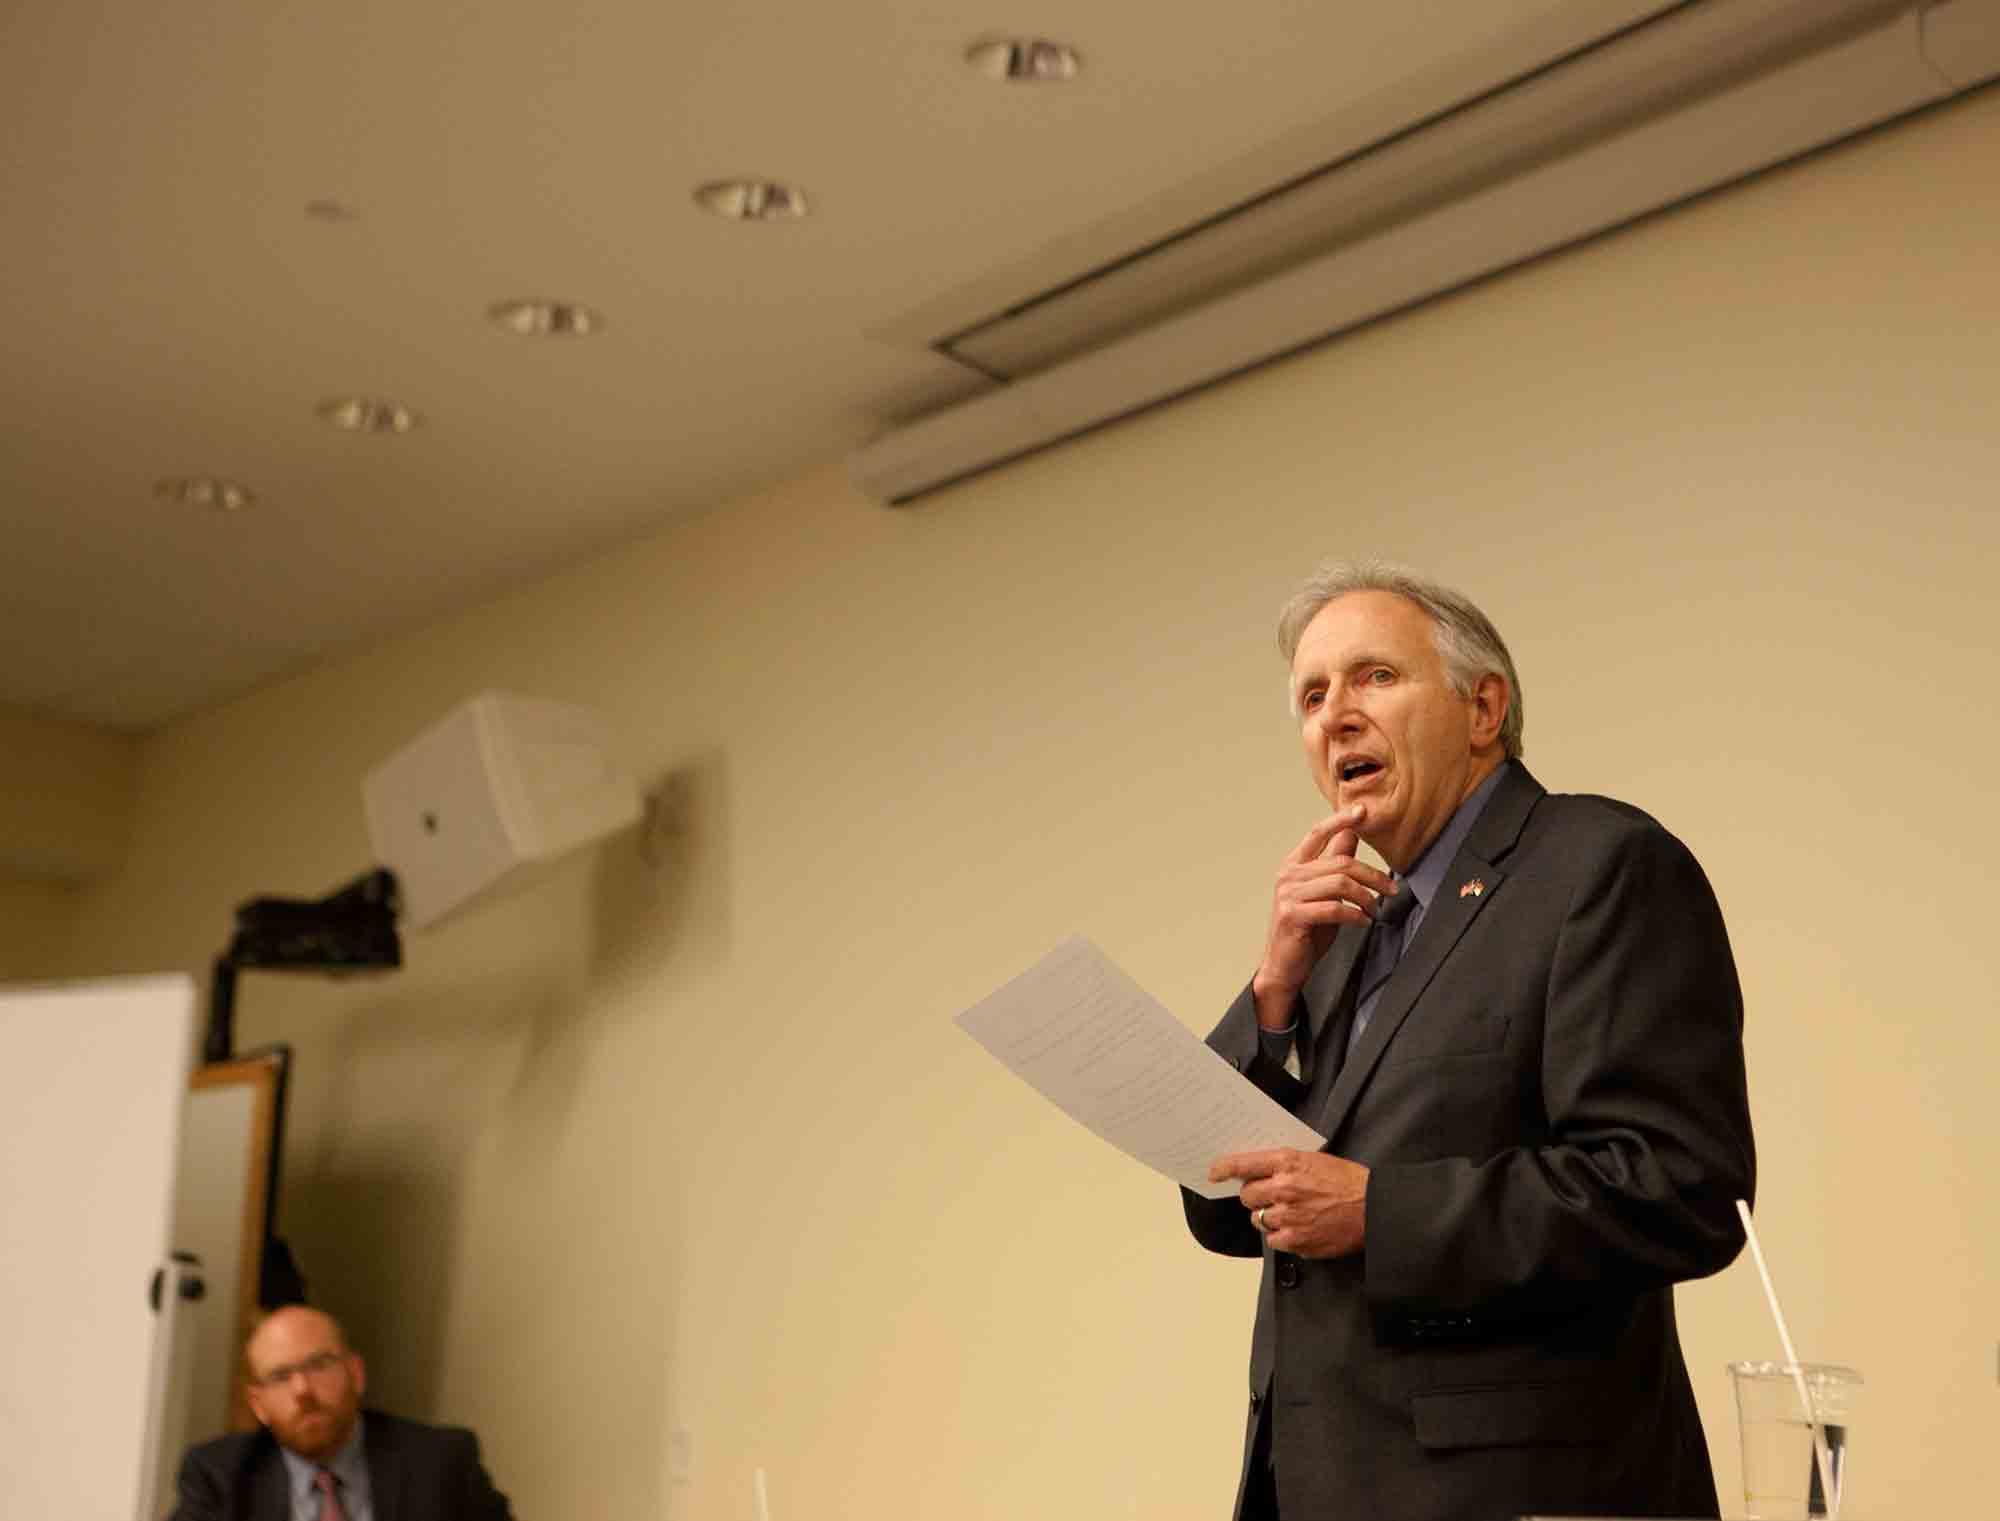 App State professor seeks 93rd District seat